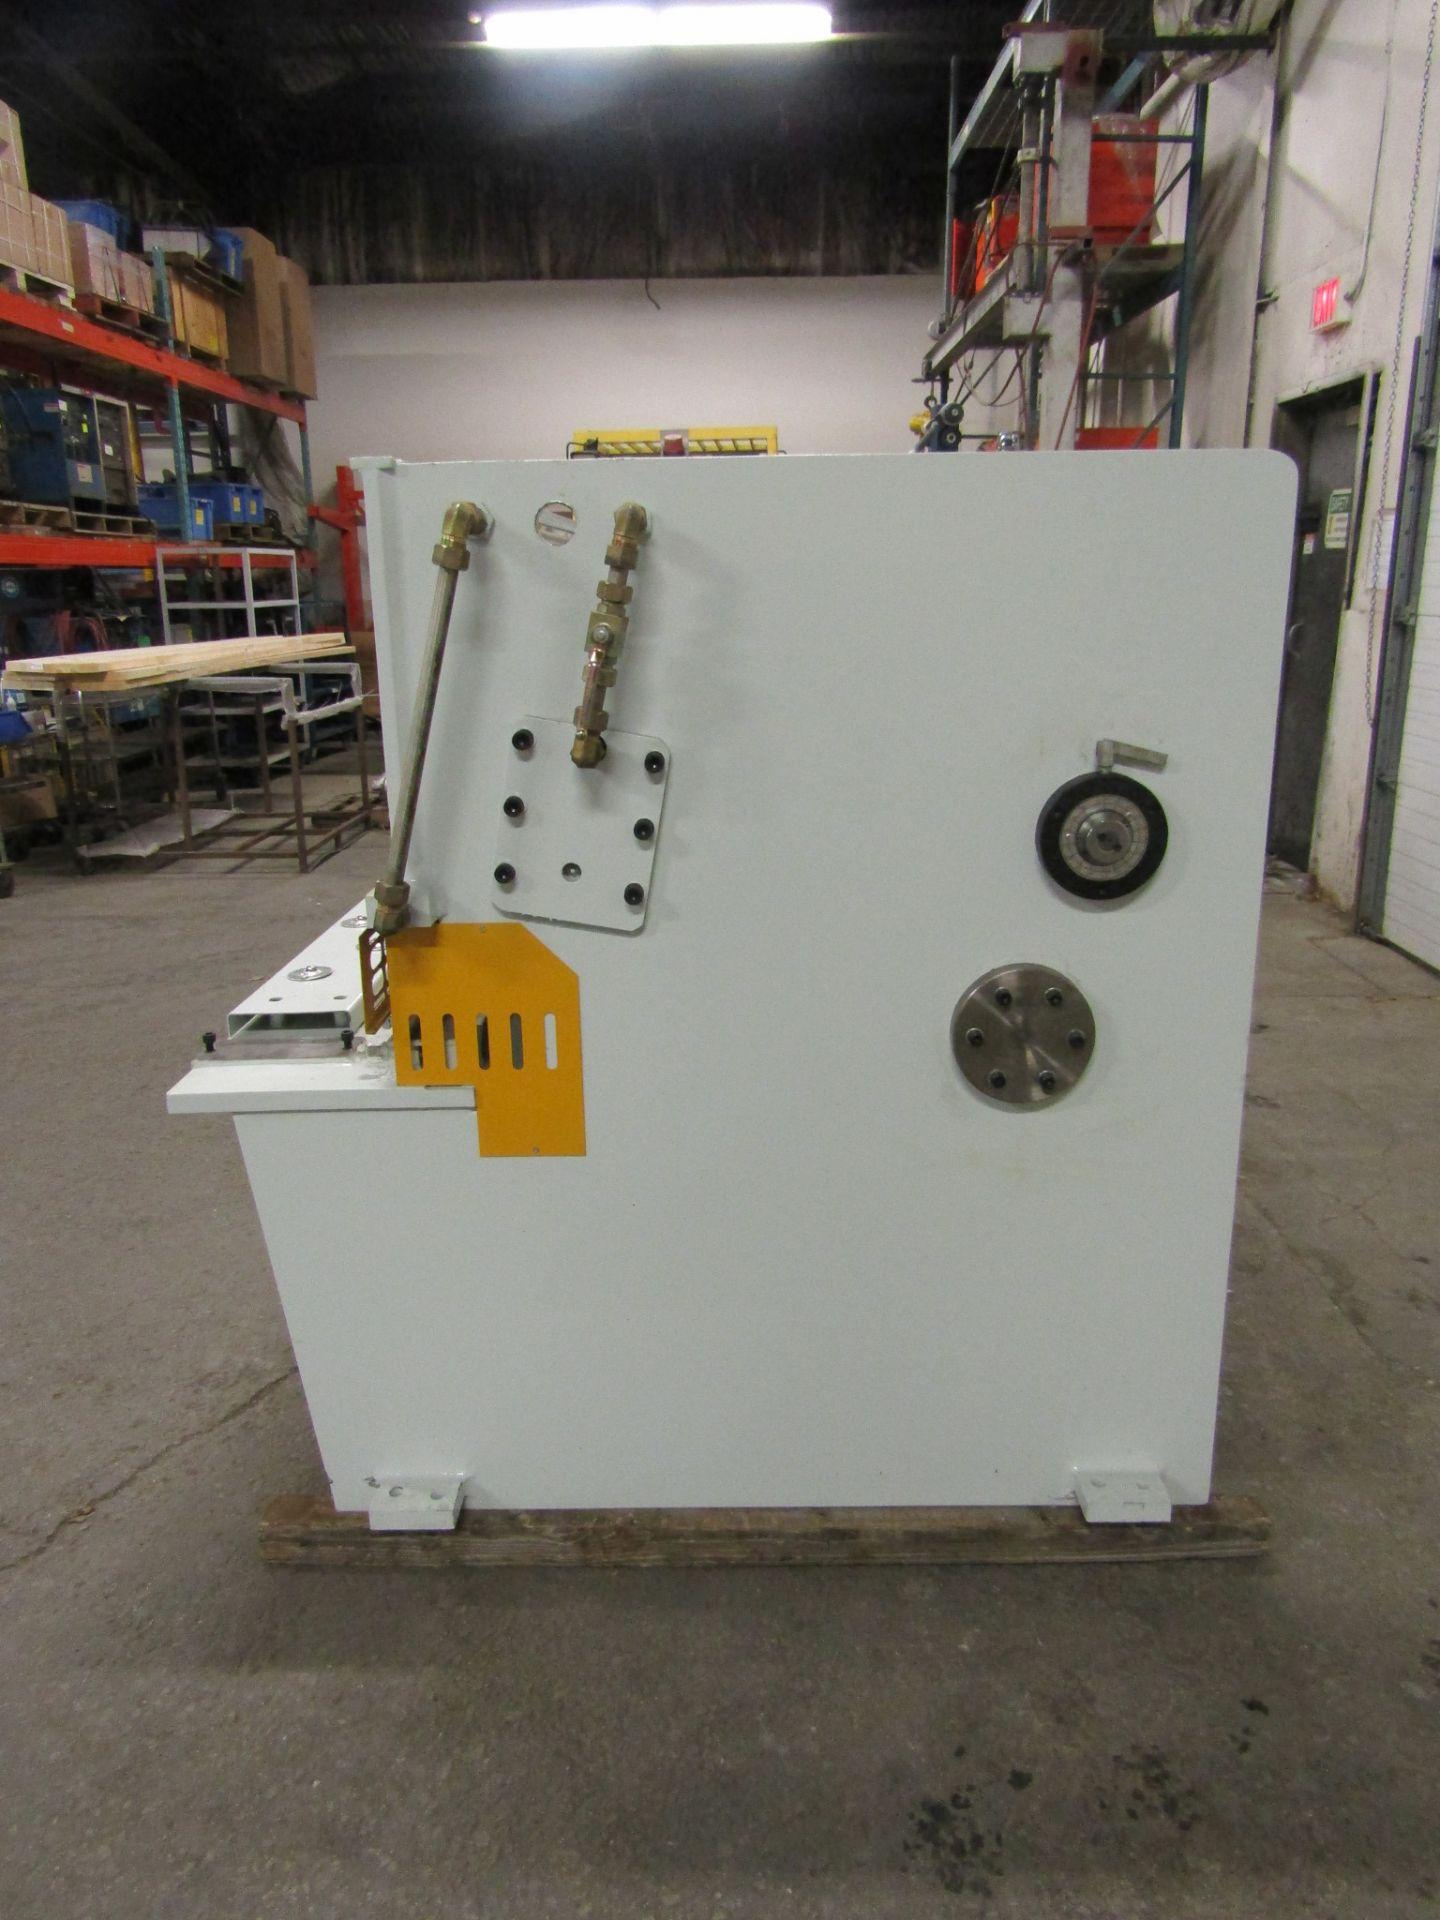 "Bernardo Hydraulic Shear 3/16"" max capacity 98"" width - 480/575V 3 phase MINT UNUSED UNIT complete - Image 3 of 6"